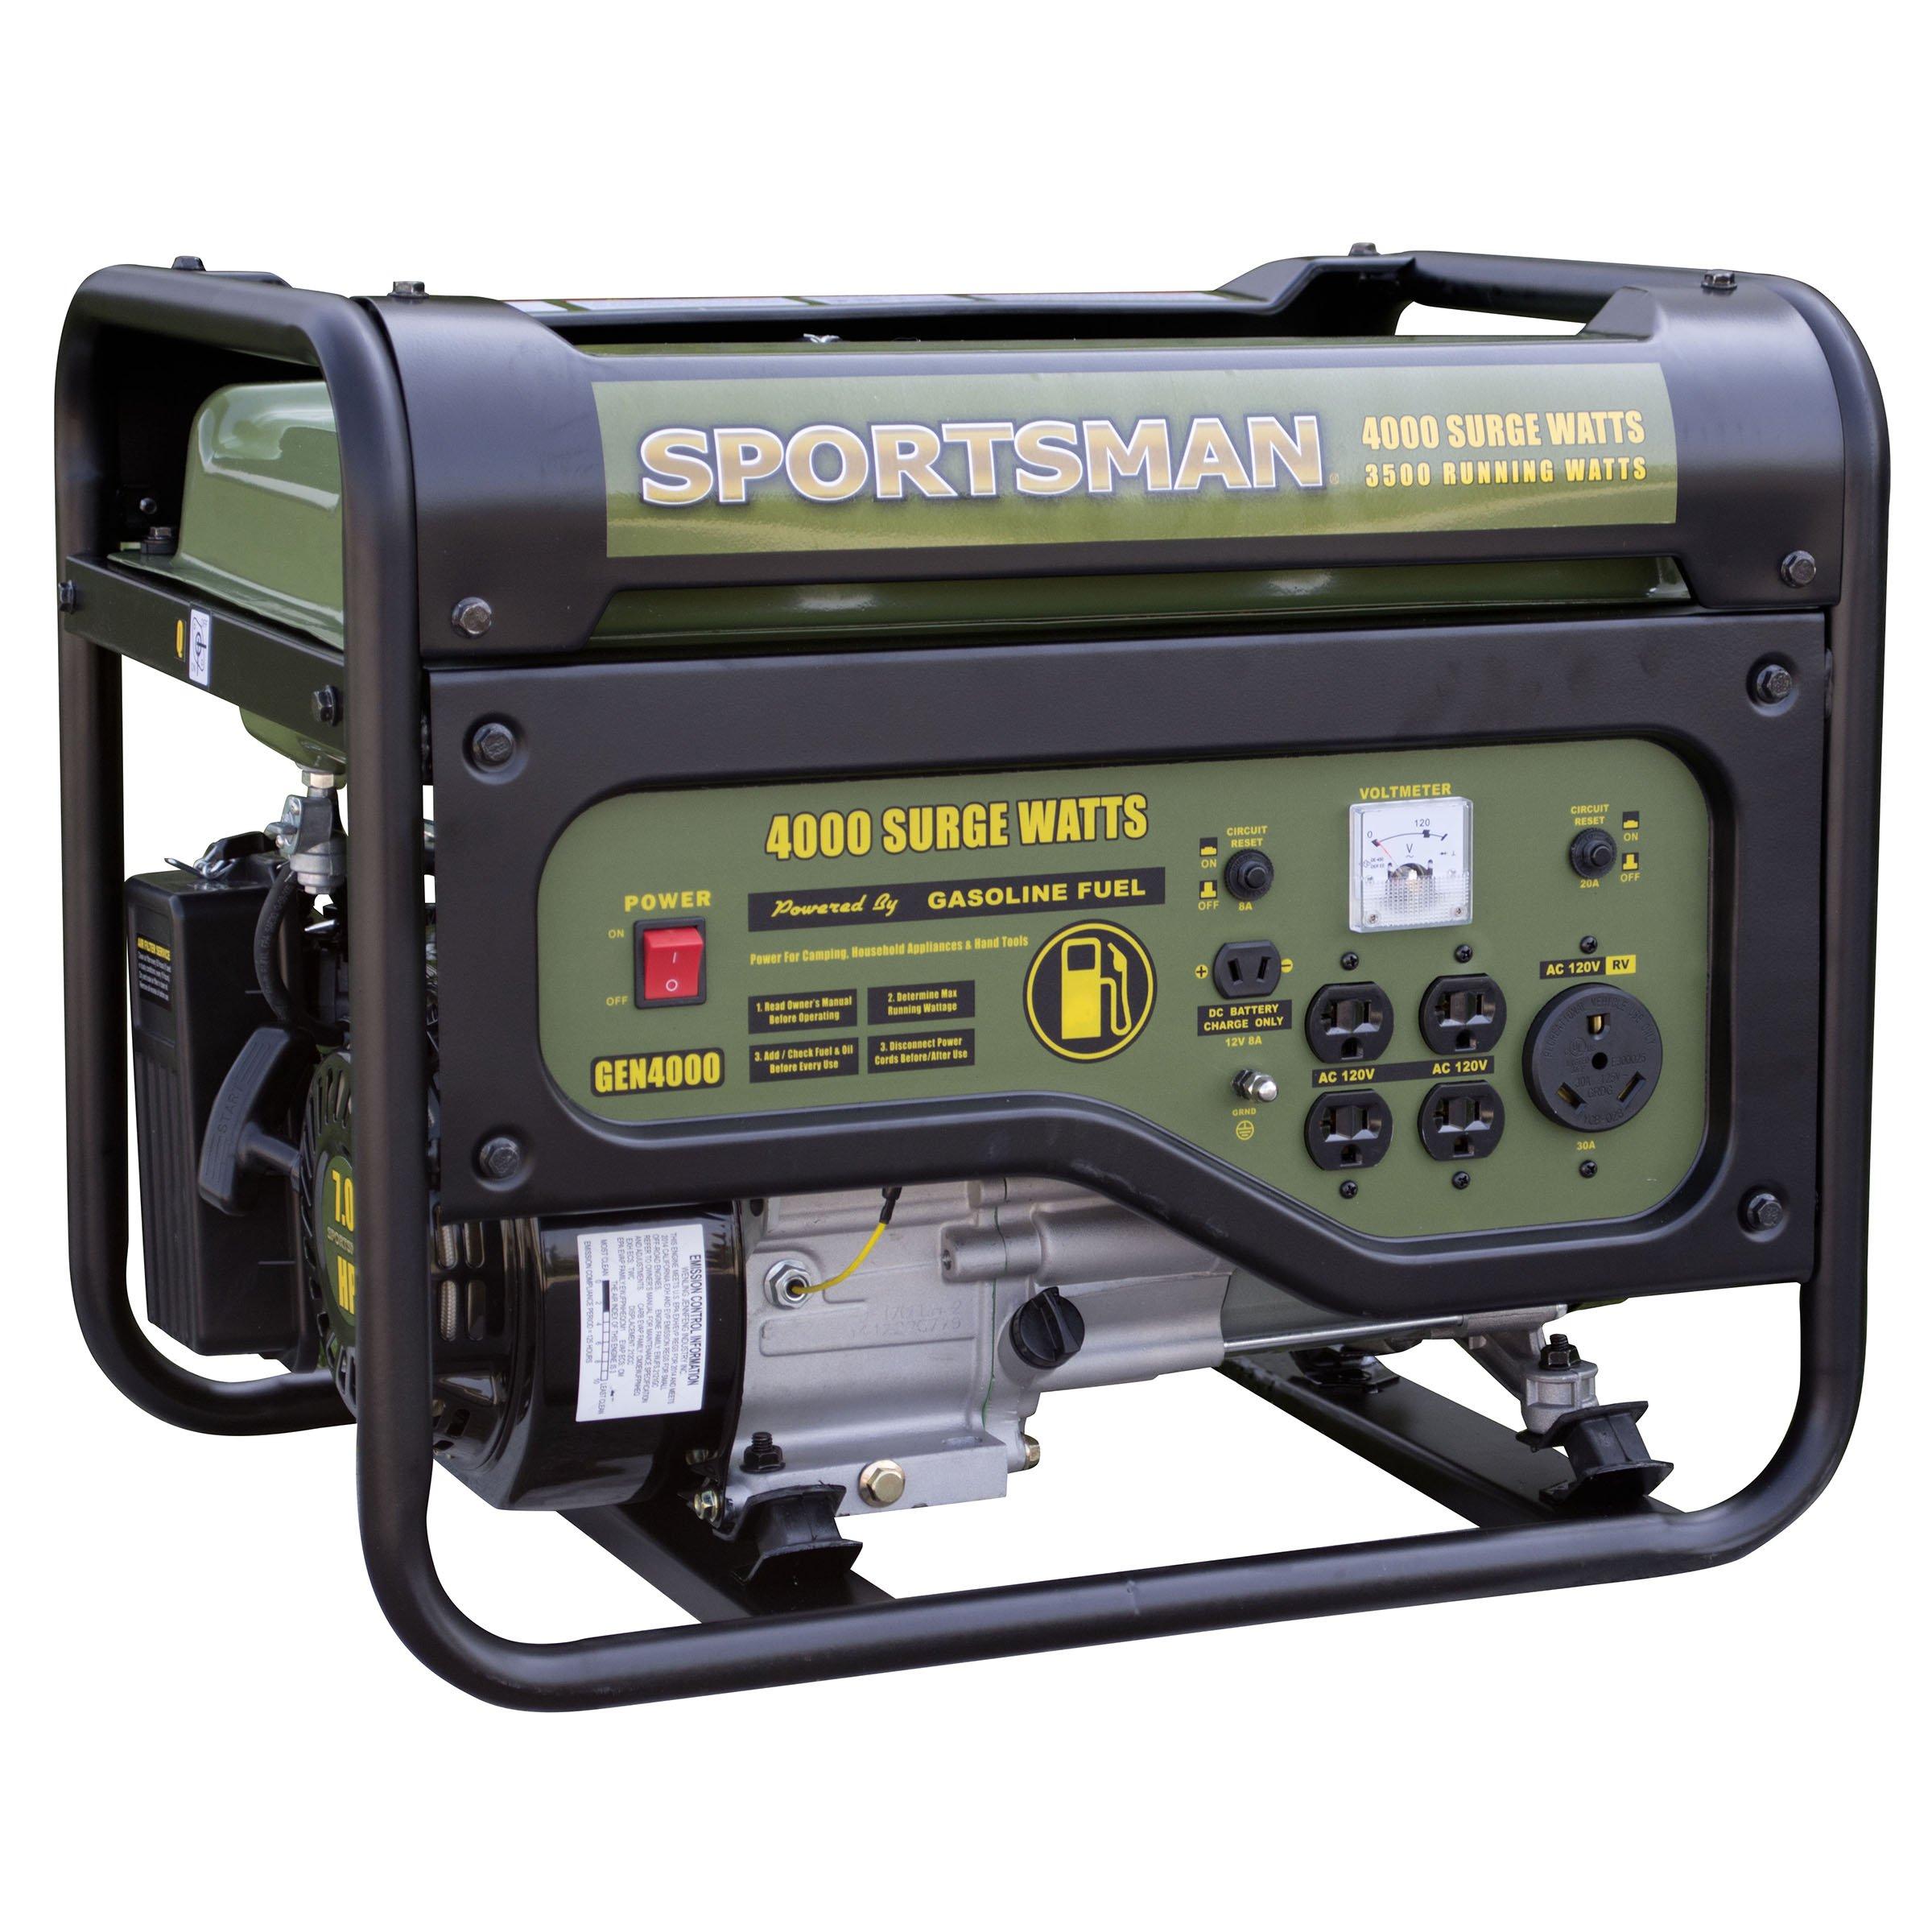 Man Sports Sportsman GEN4000, 3500 Running Watts/4000 Starting Watts, Gas Powered Portable Generator